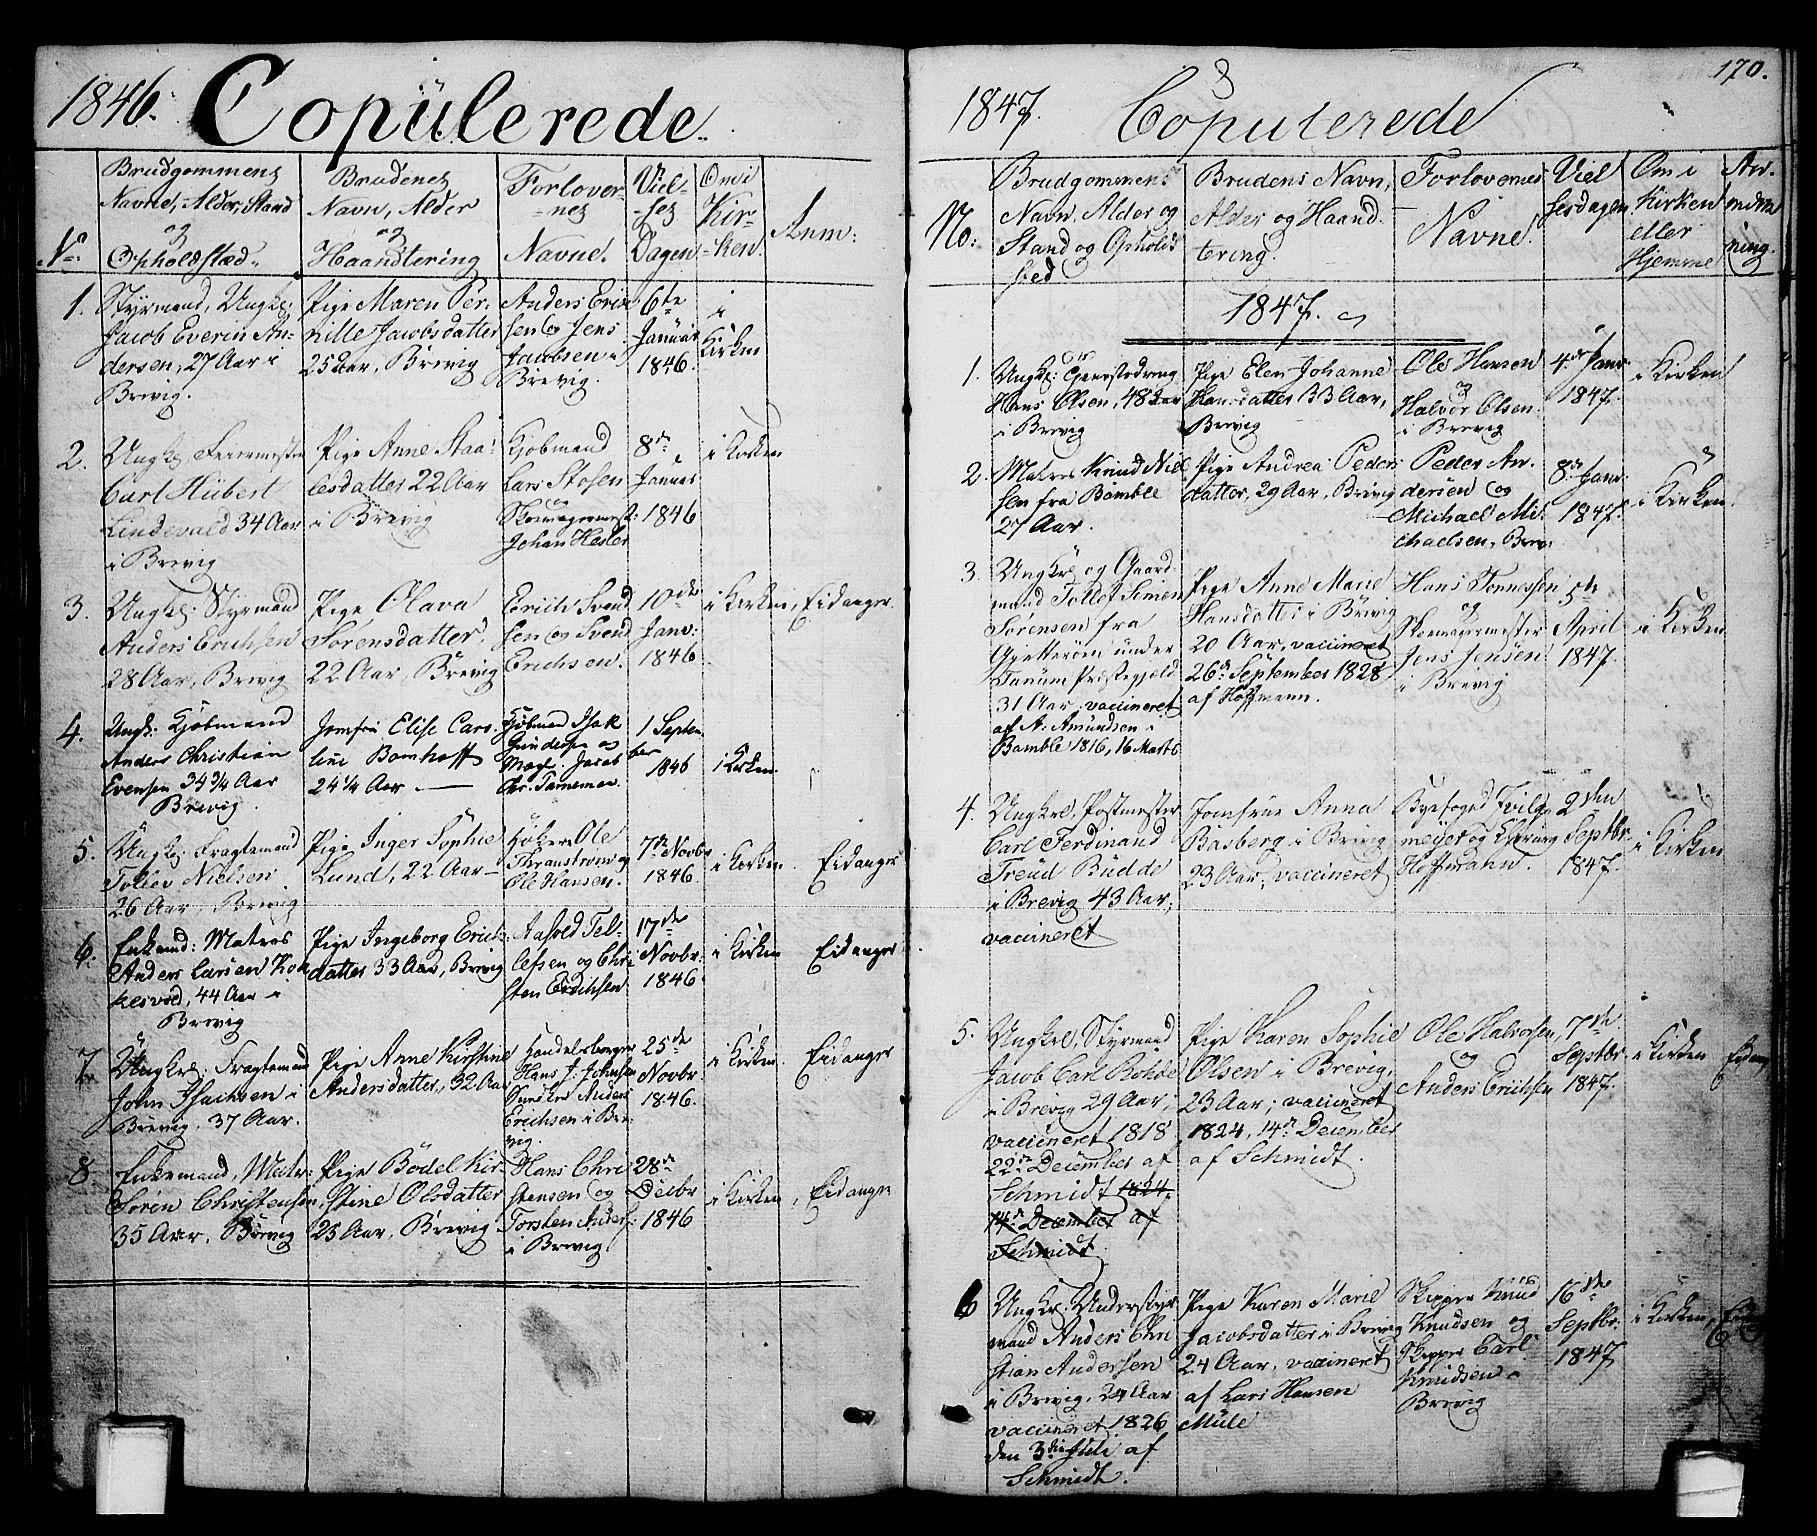 SAKO, Brevik kirkebøker, G/Ga/L0002: Klokkerbok nr. 2, 1846-1865, s. 170